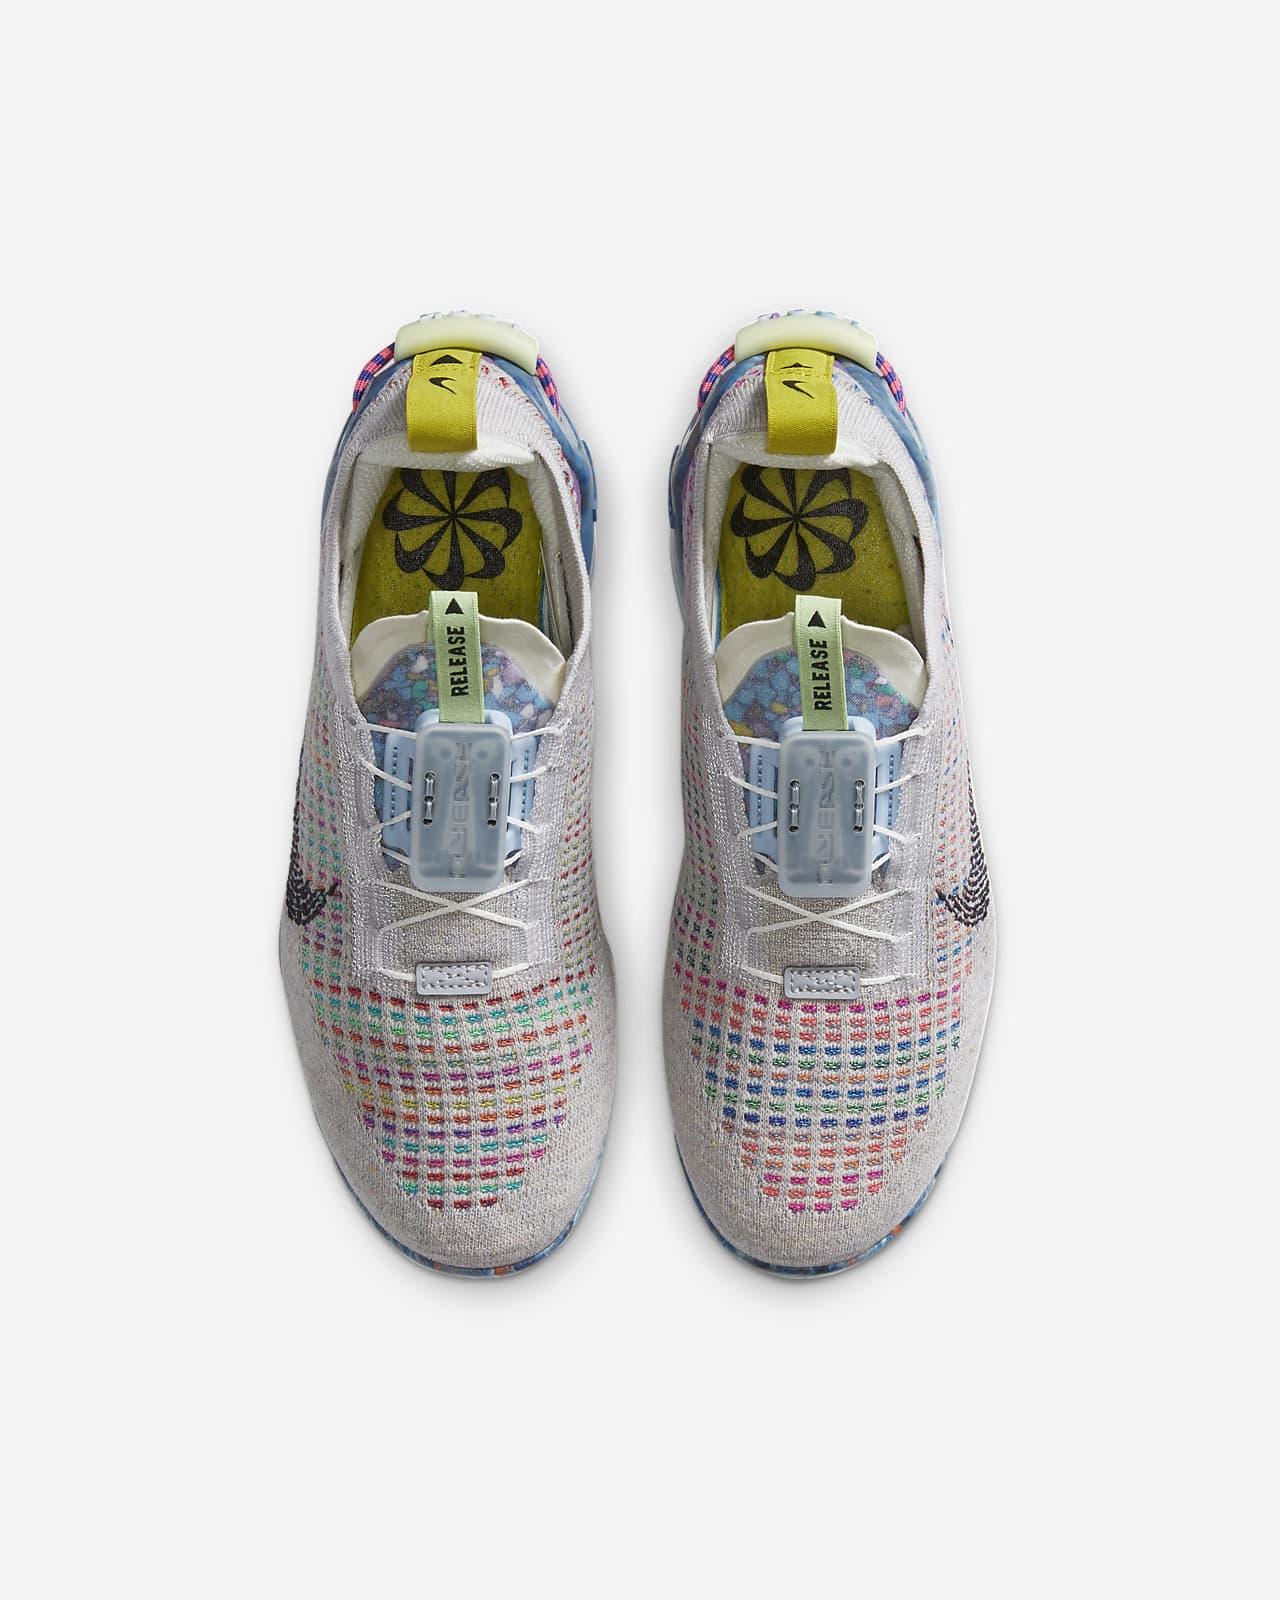 Nike Air Vapormax 97 Japan GS on 2020 Pinterest